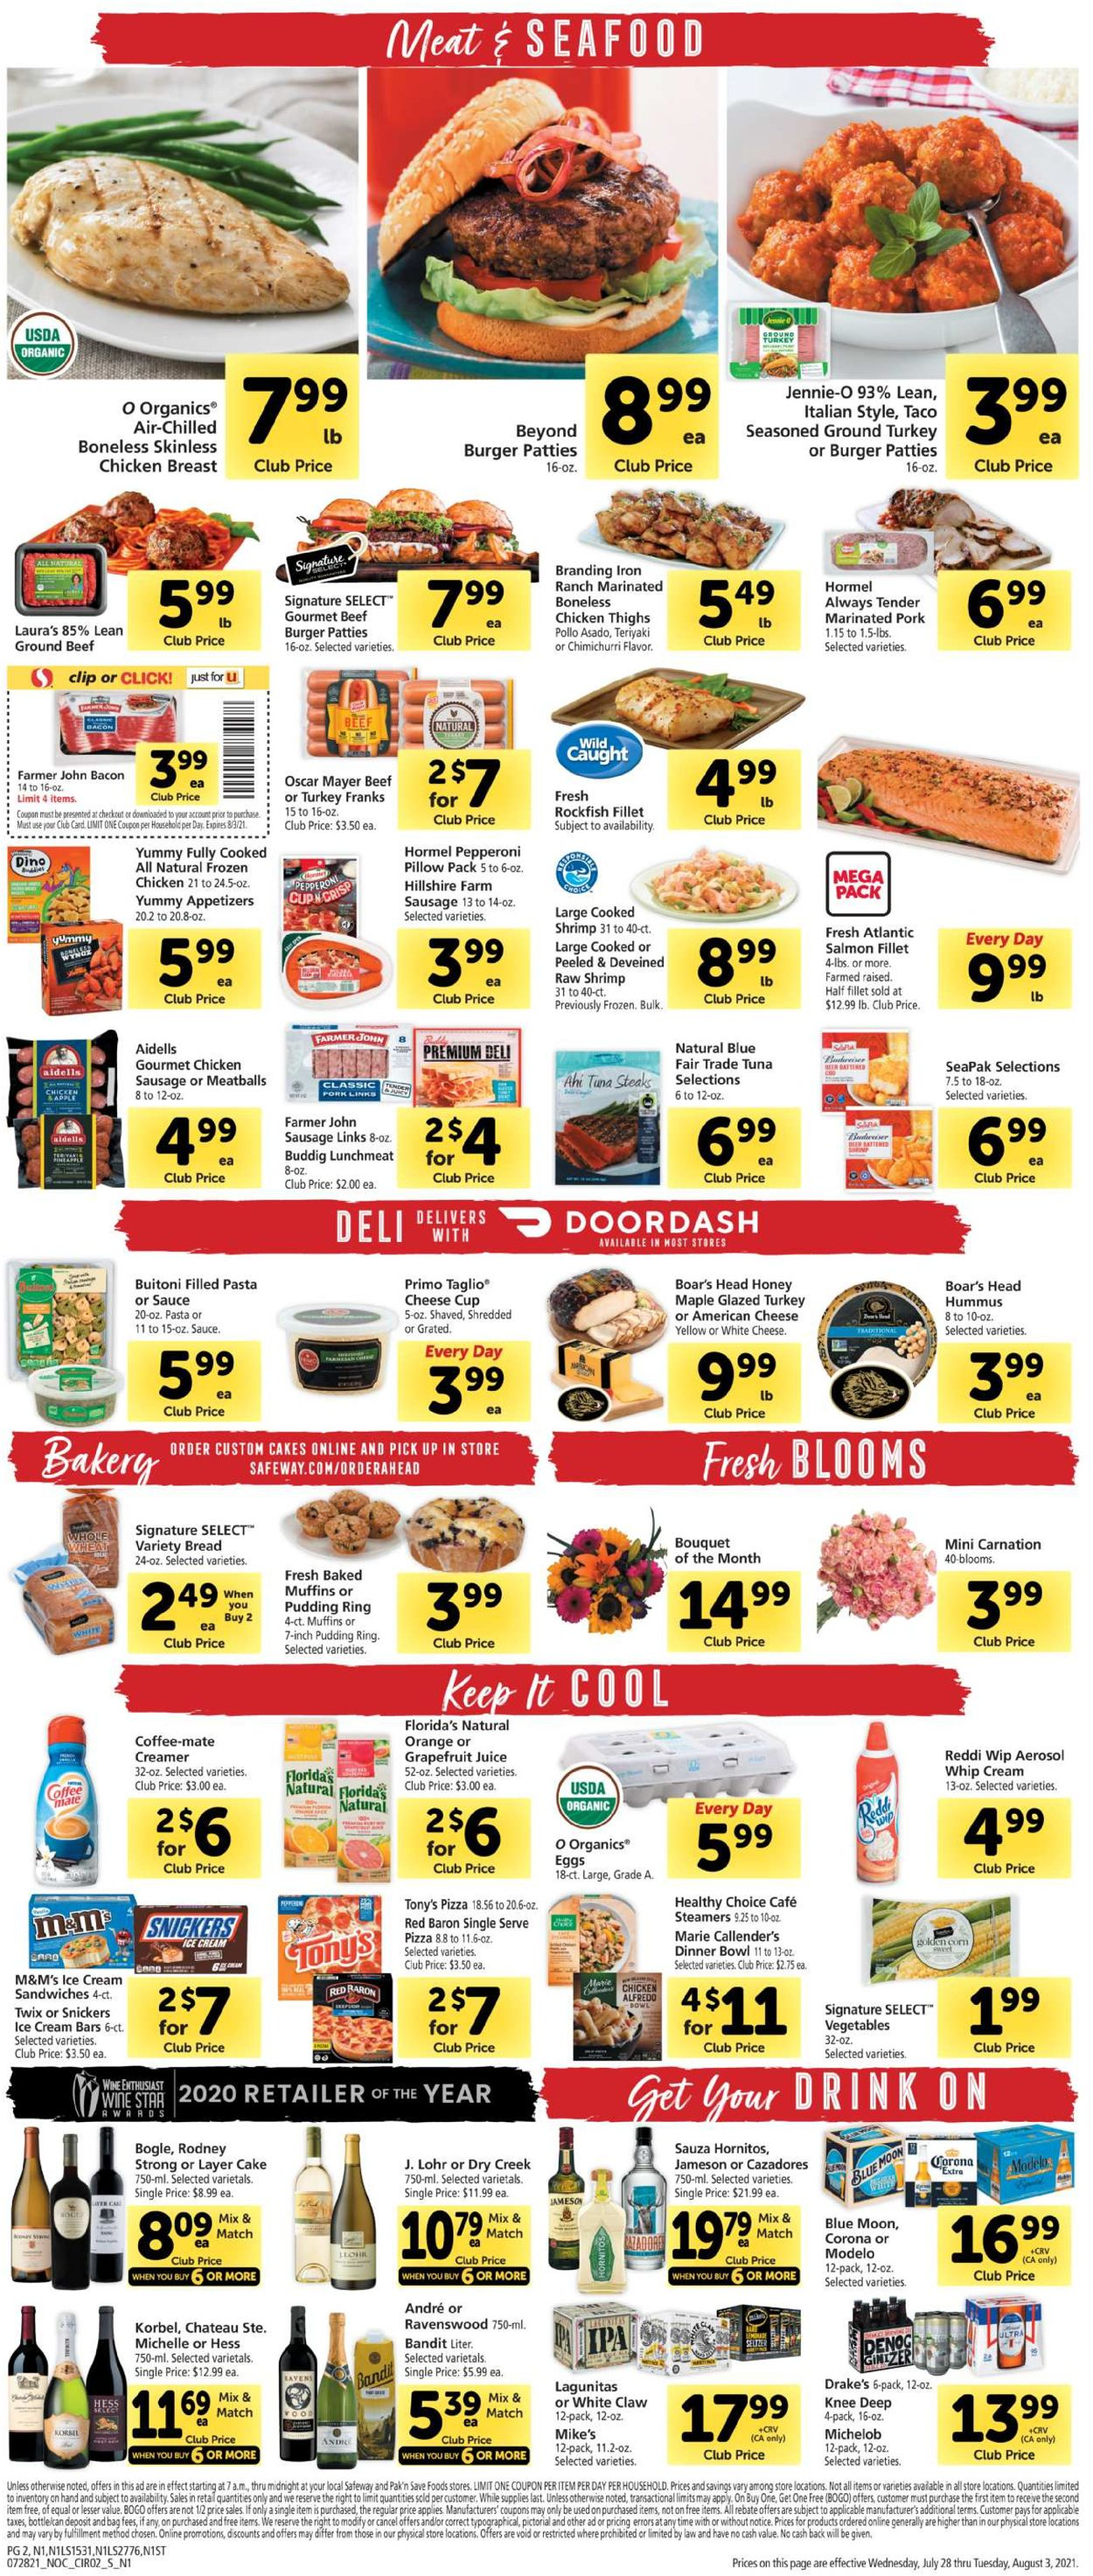 Safeway Weekly Ad Circular - valid 07/28-08/03/2021 (Page 2)